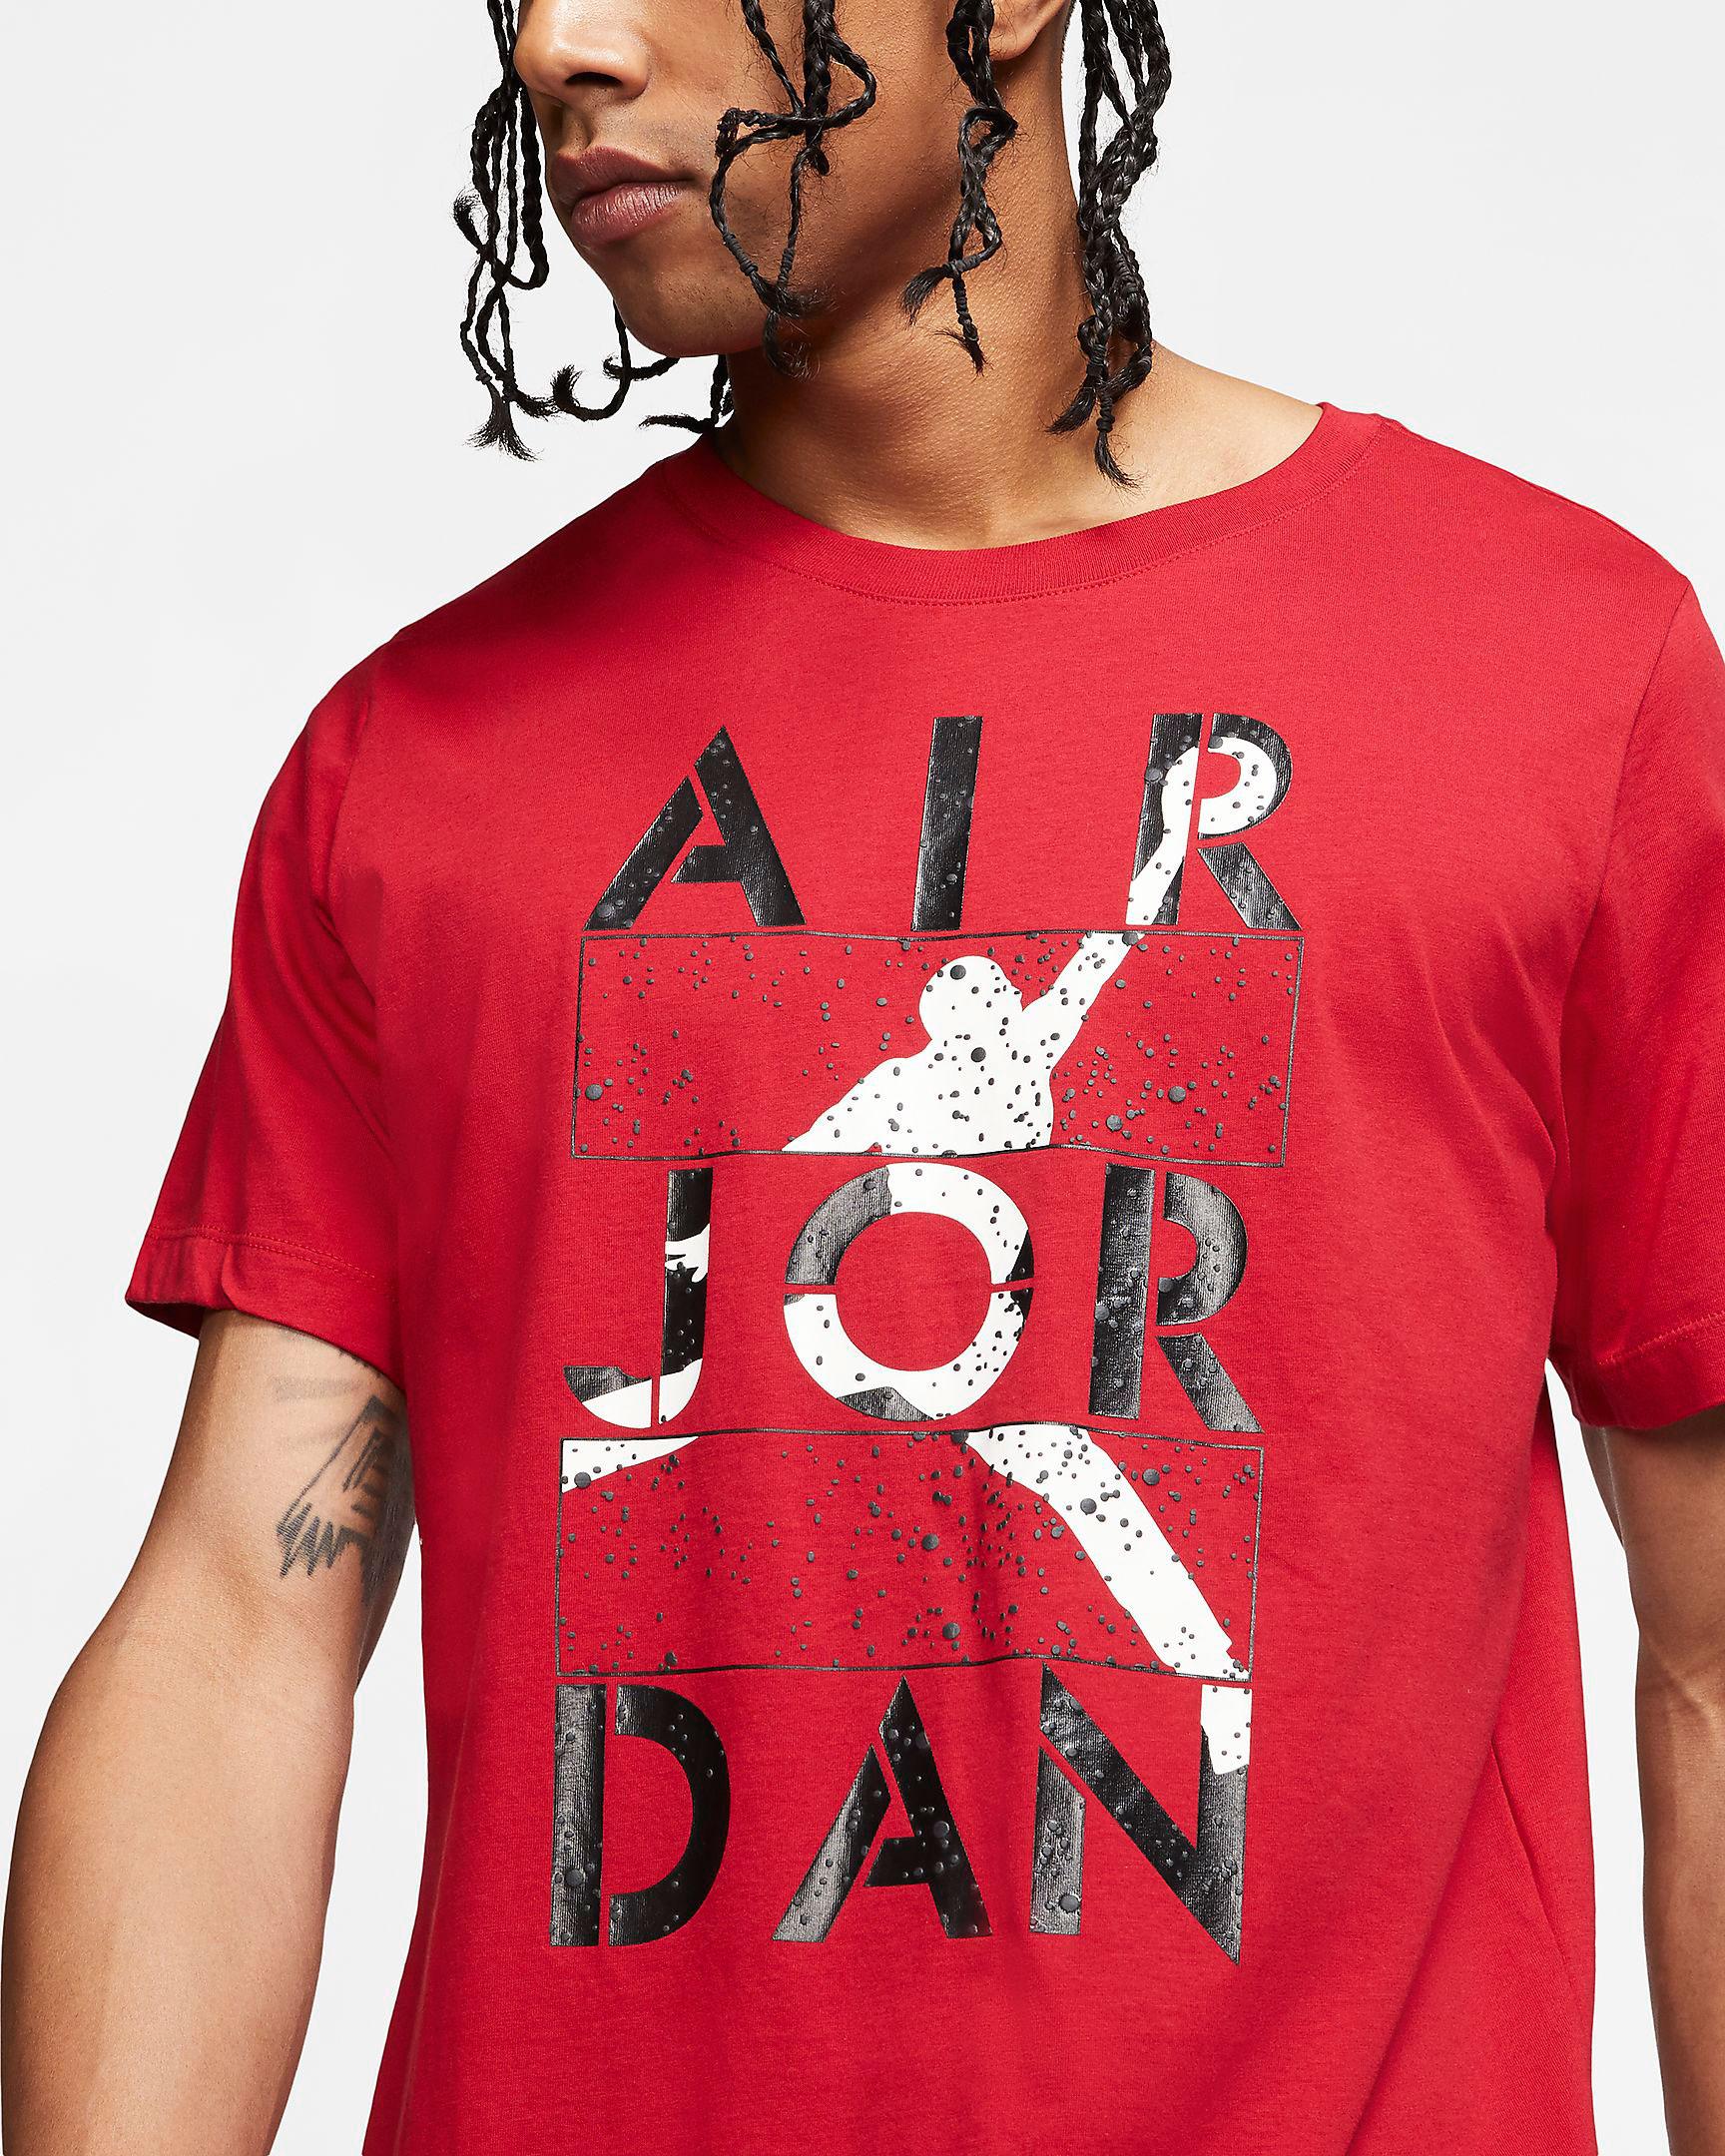 jordan-gym-red-stencil-shirt